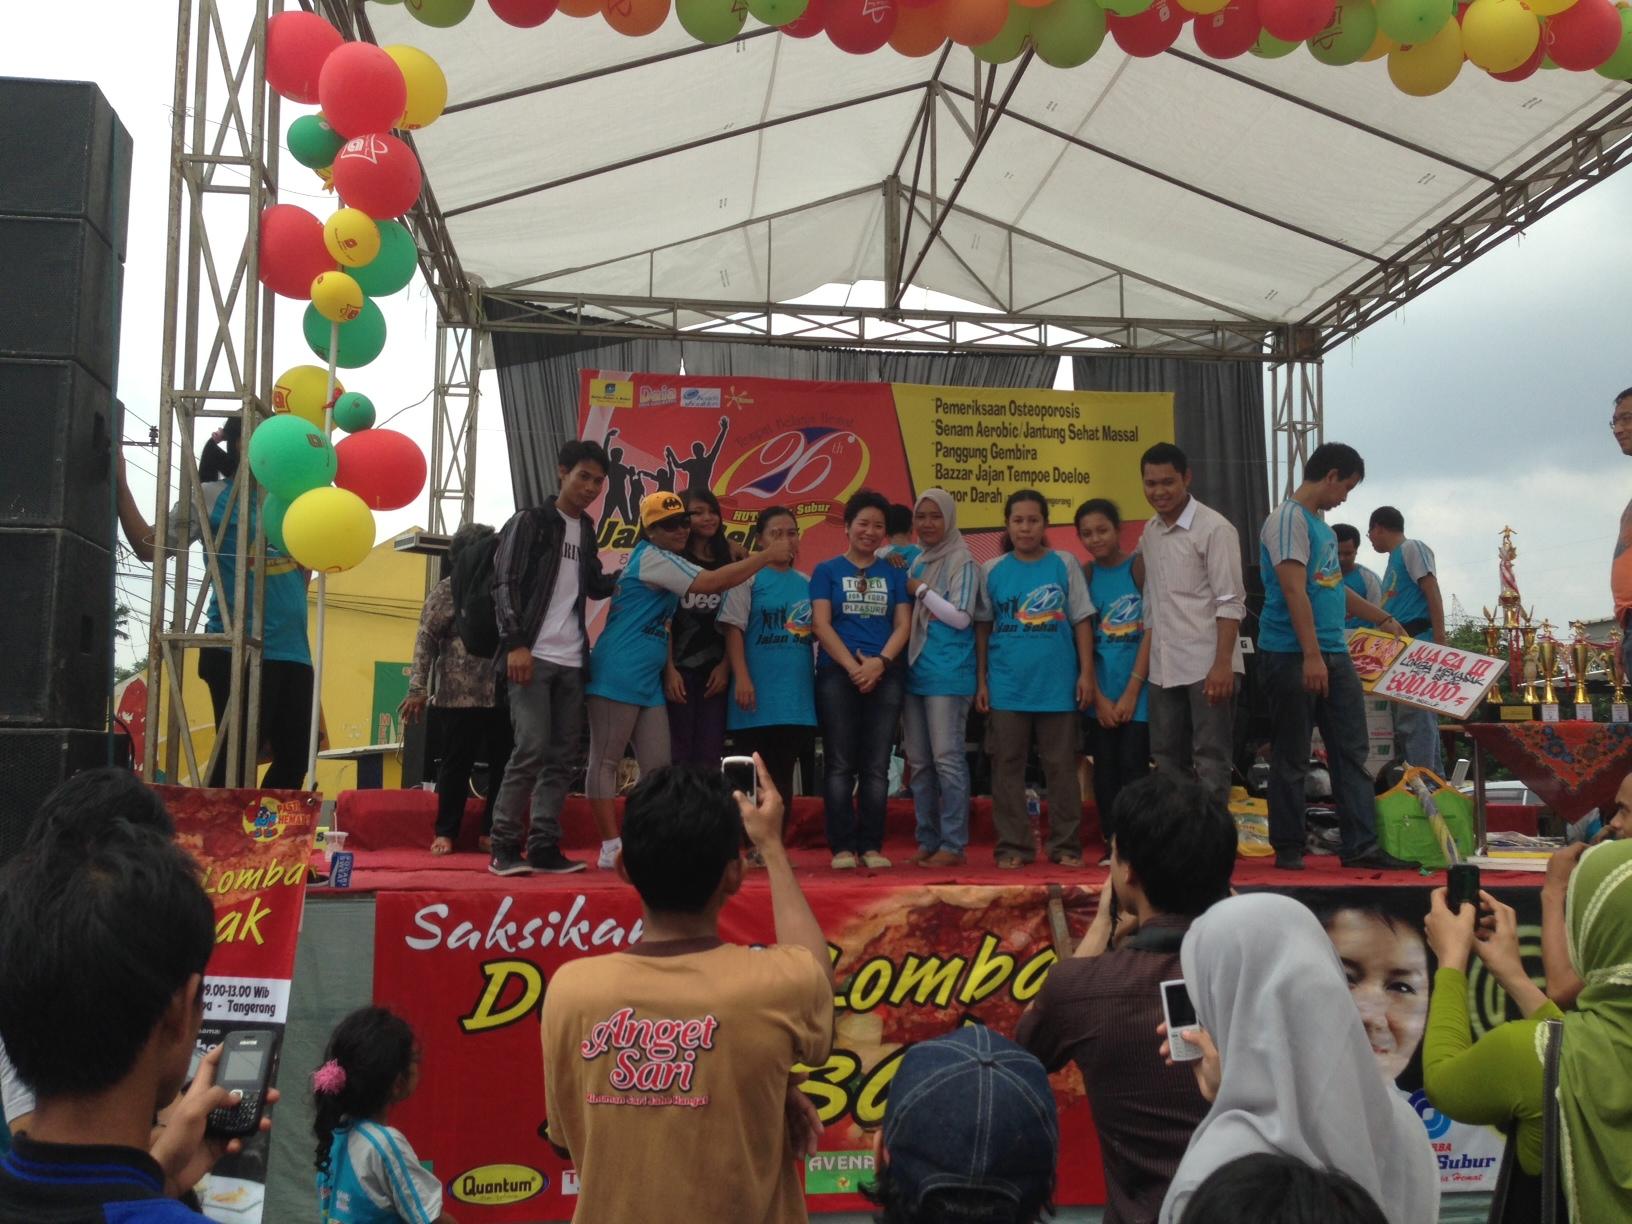 Liputan Event di Toserba Sabar Subur, Cikupa – Tangerang